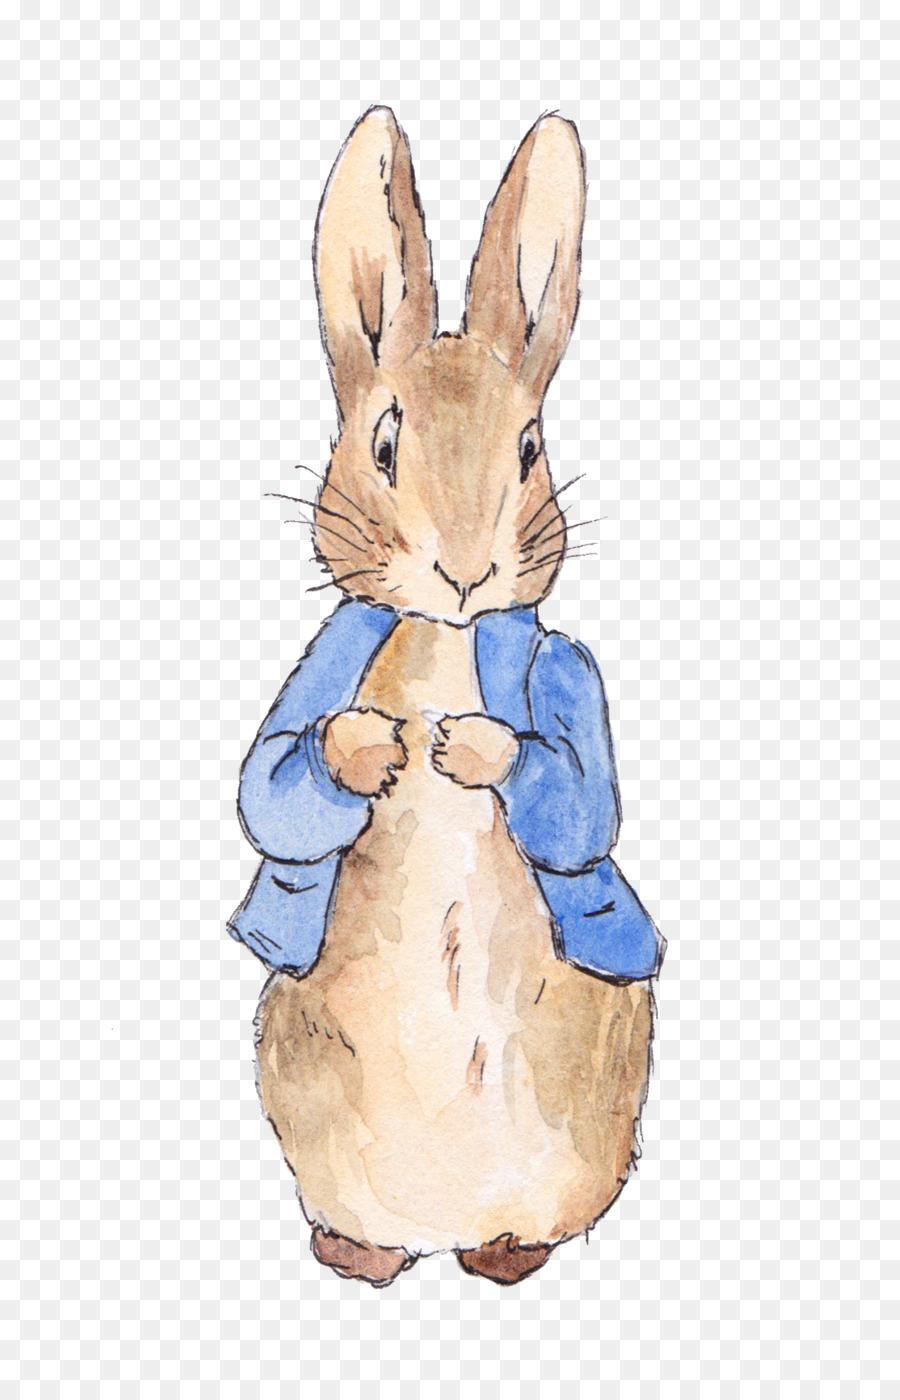 Peter Rabbit Png Free Peter Rabbit Png Transparent Images 28761 Pngio Peter Rabbit Illustration Peter Rabbit And Friends Rabbit Illustration